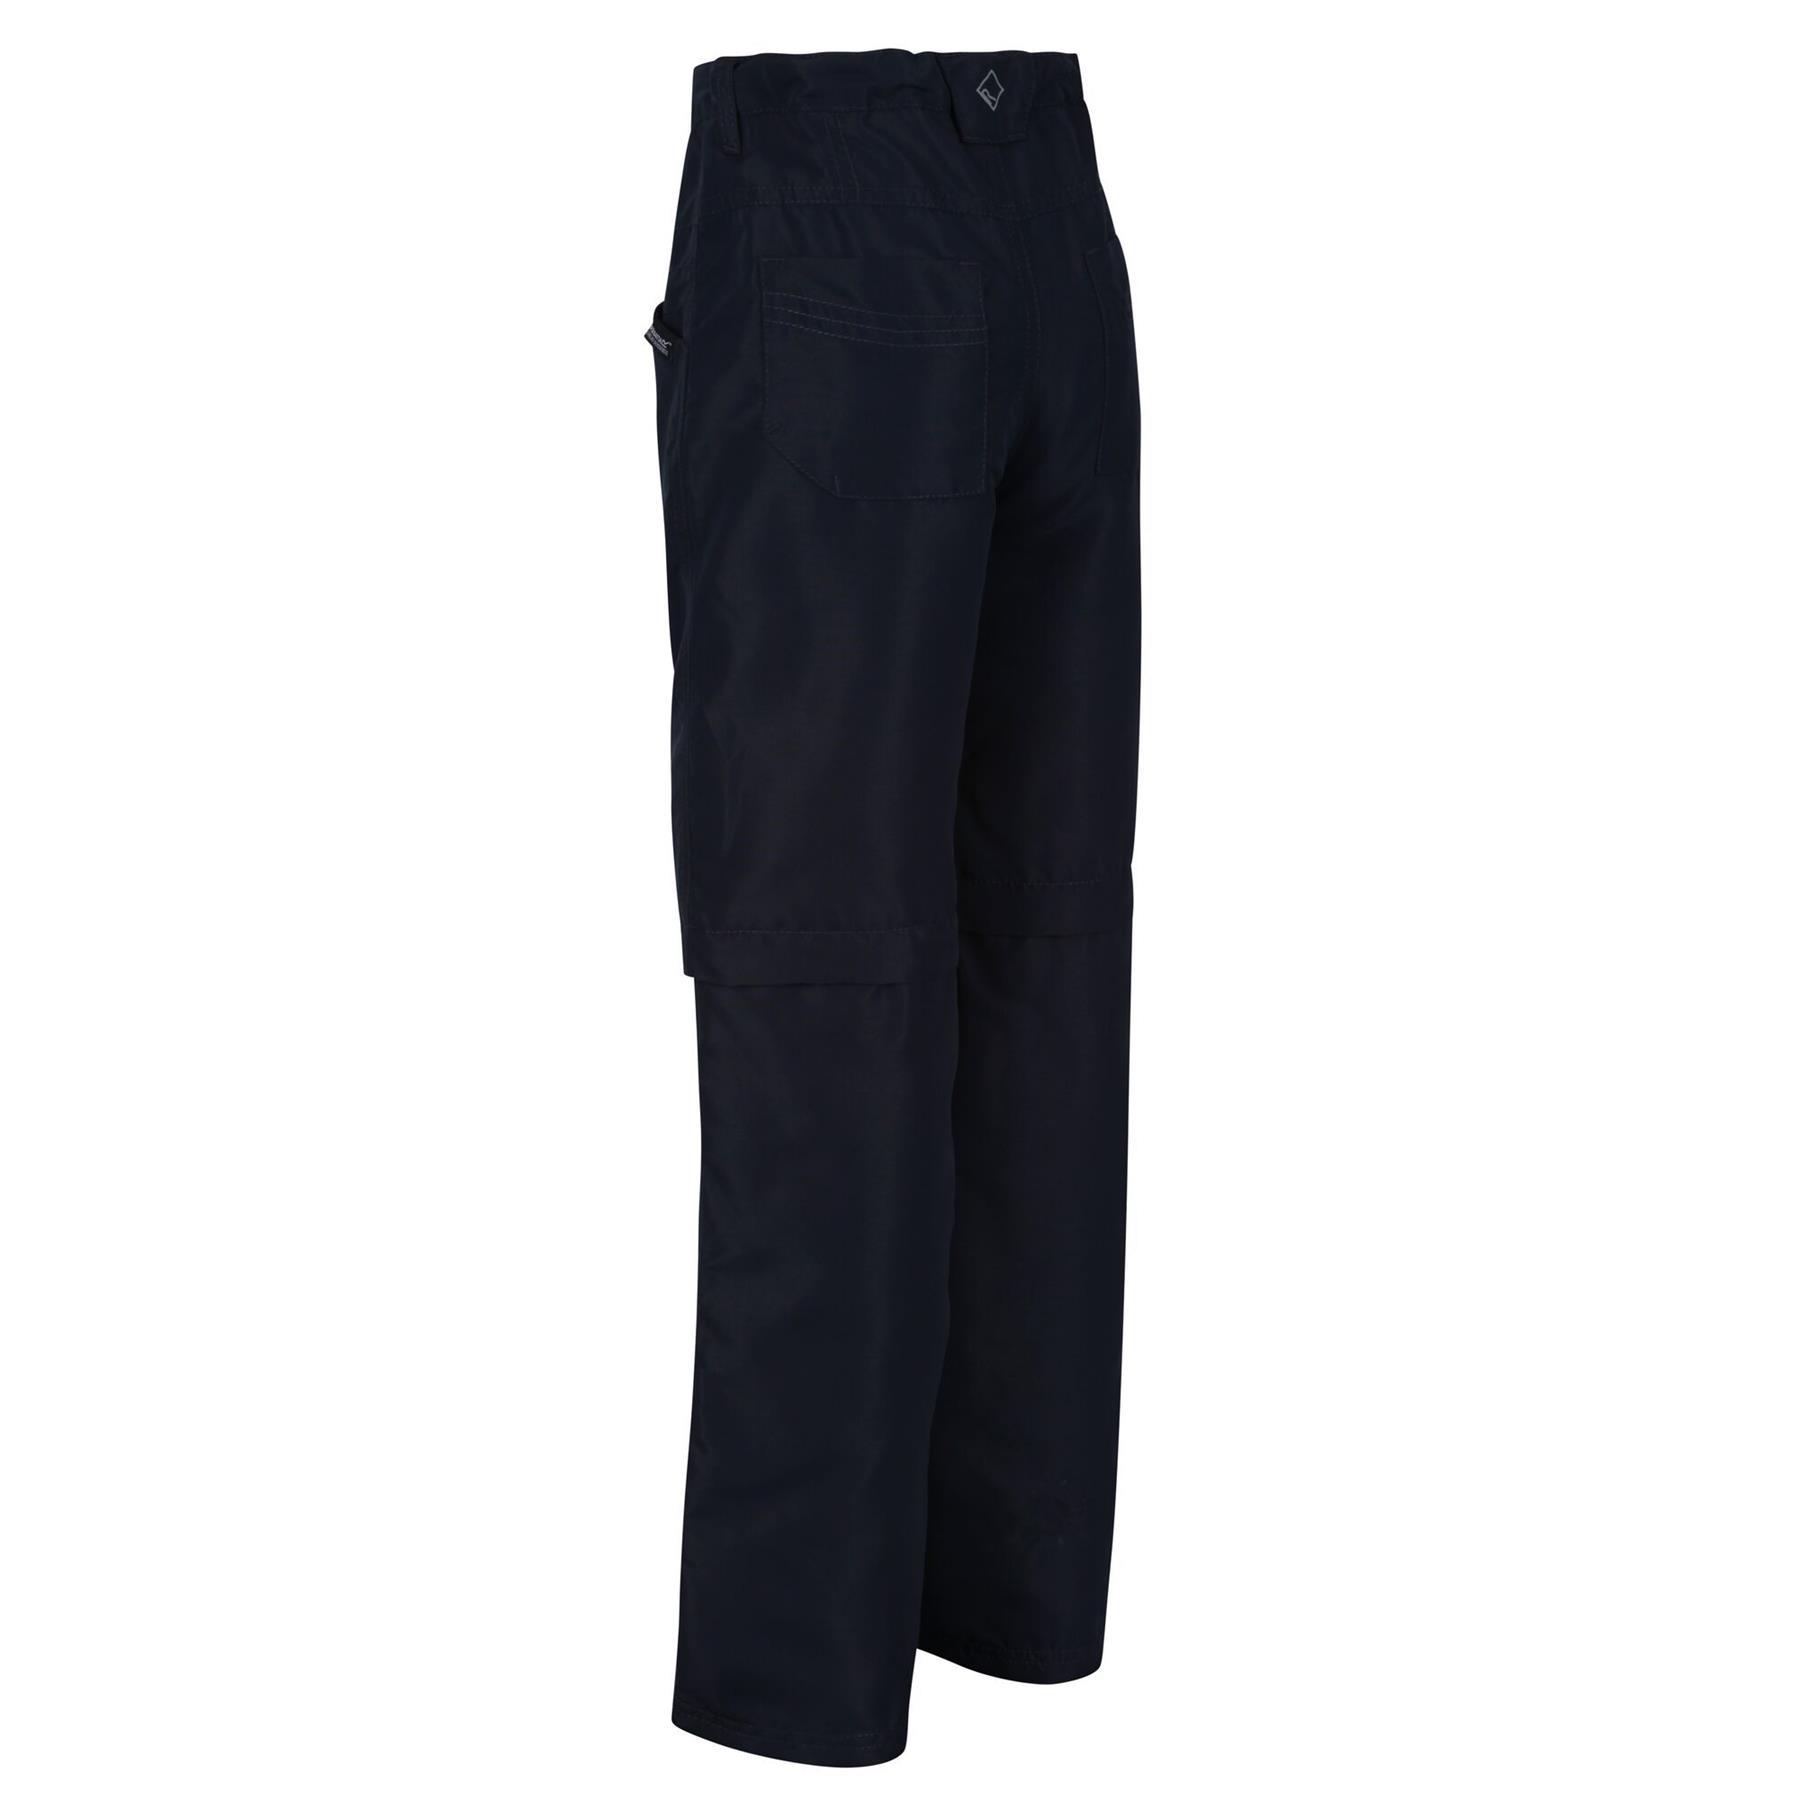 miniatuur 5 - Regatta Kids Sorcer II Zip Off Convertible Trousers Boys Girls